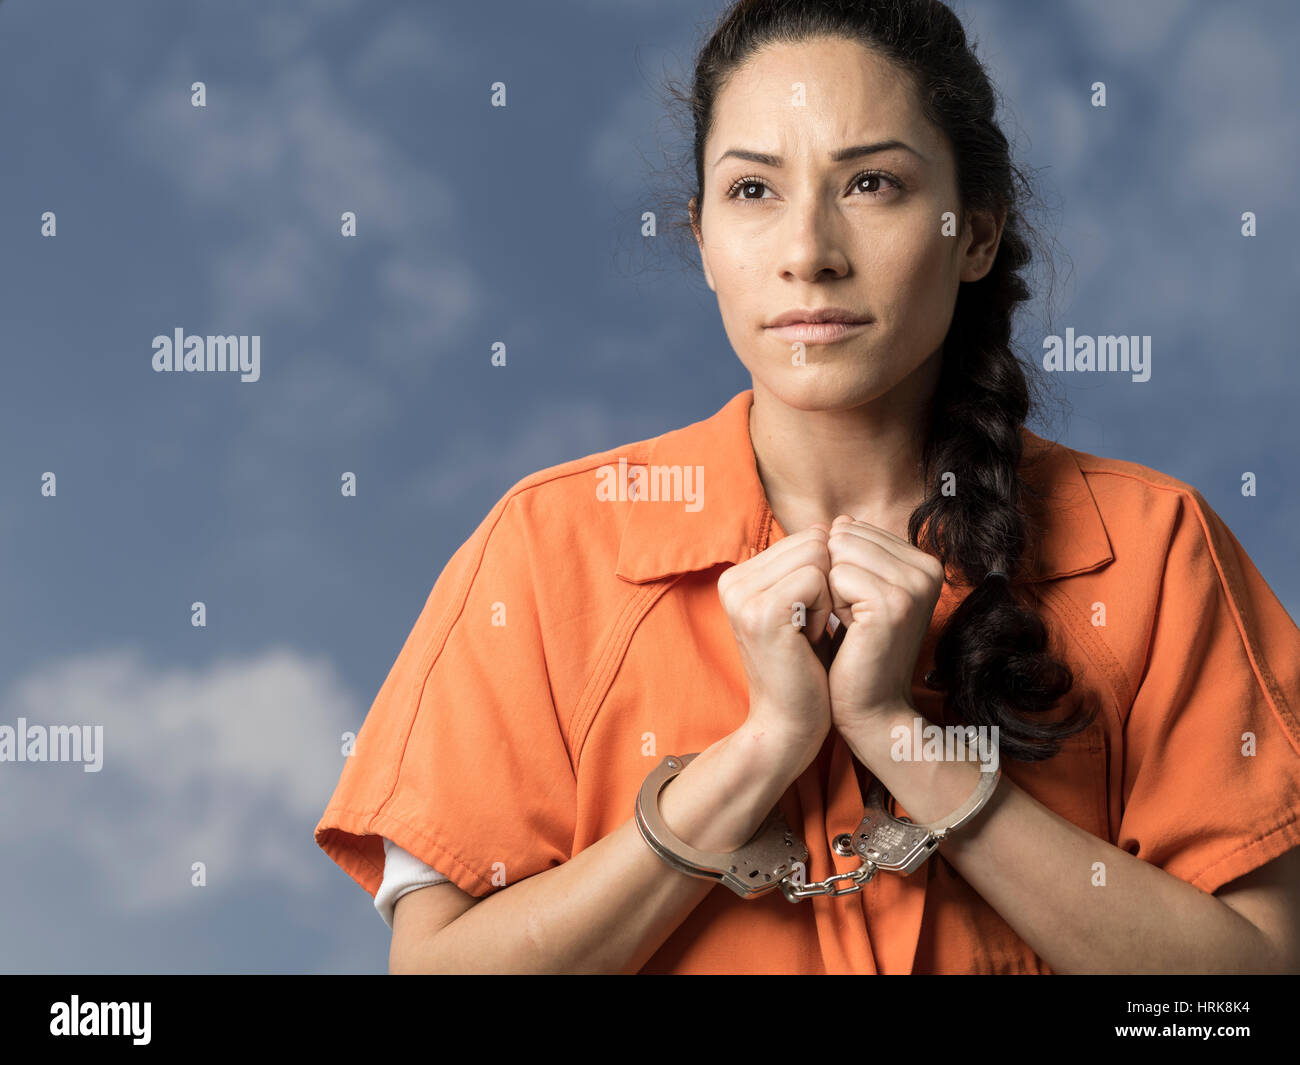 woman putting on prison uniform